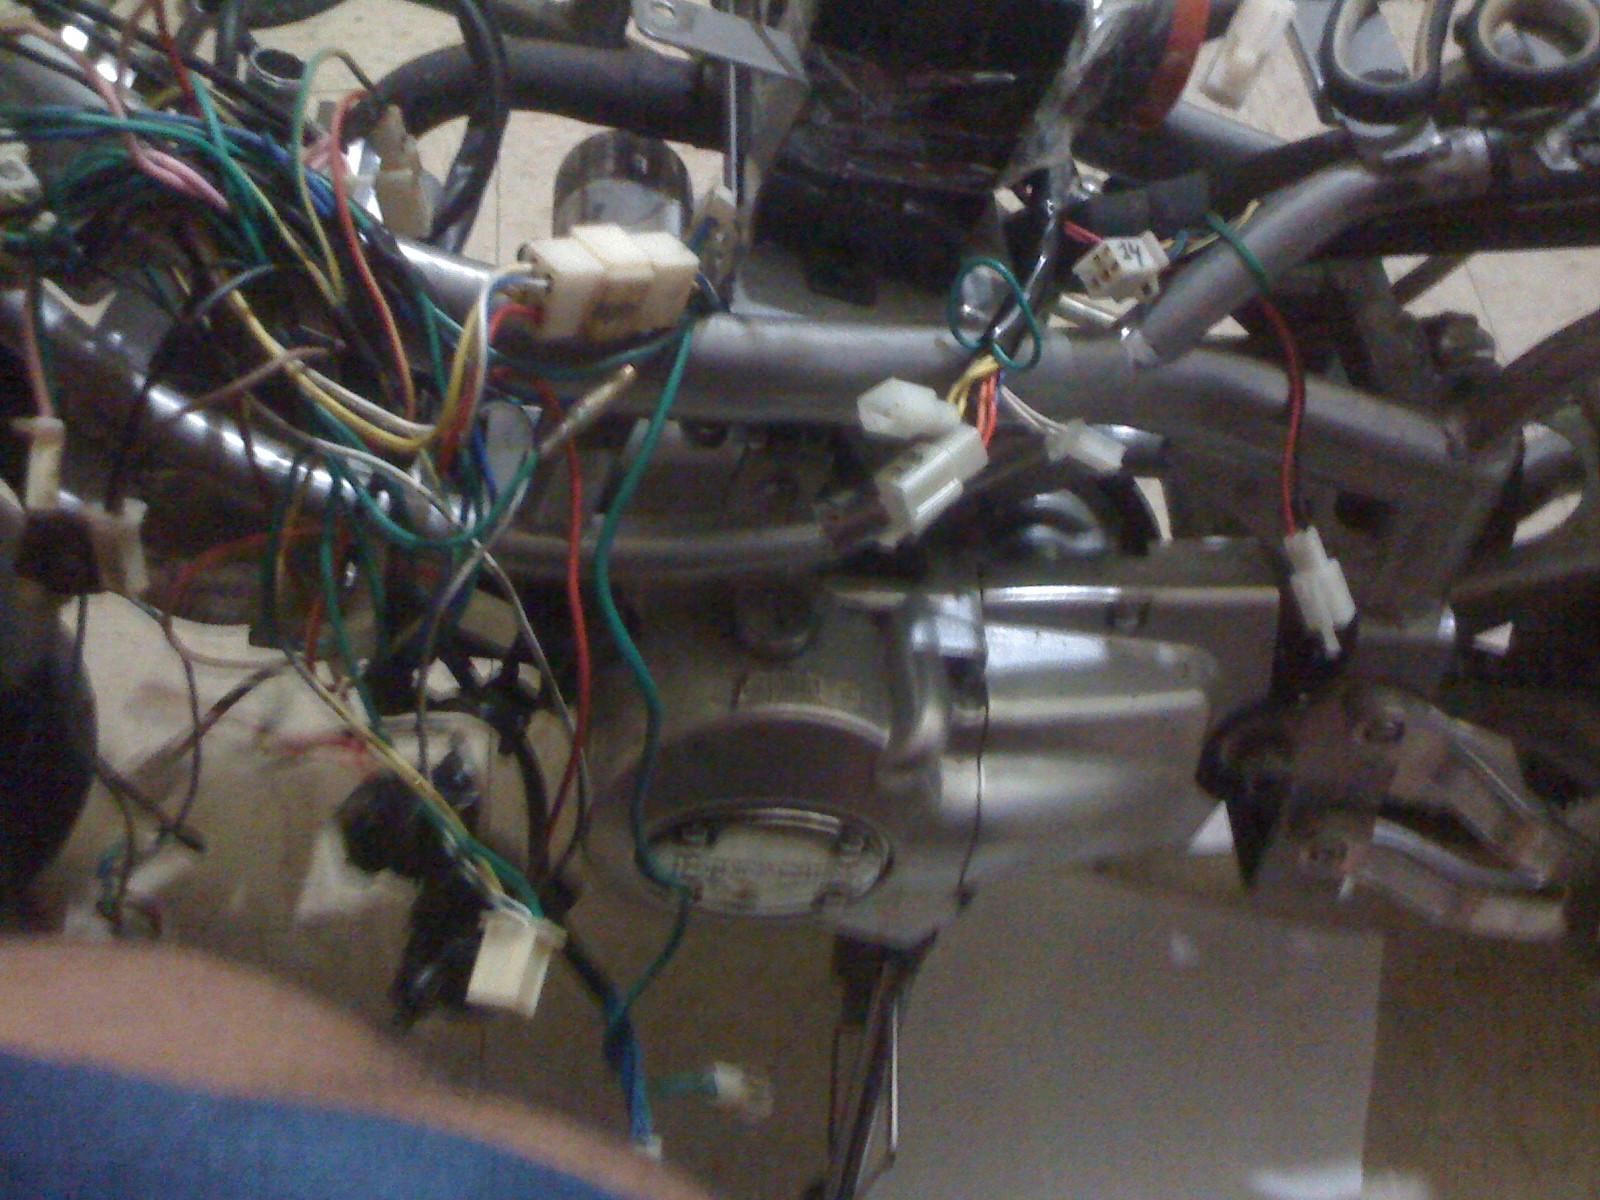 Wiring Diagram For Loncin 110cc Gm Starter Wiring 85 Begeboy Wiring Diagram Source